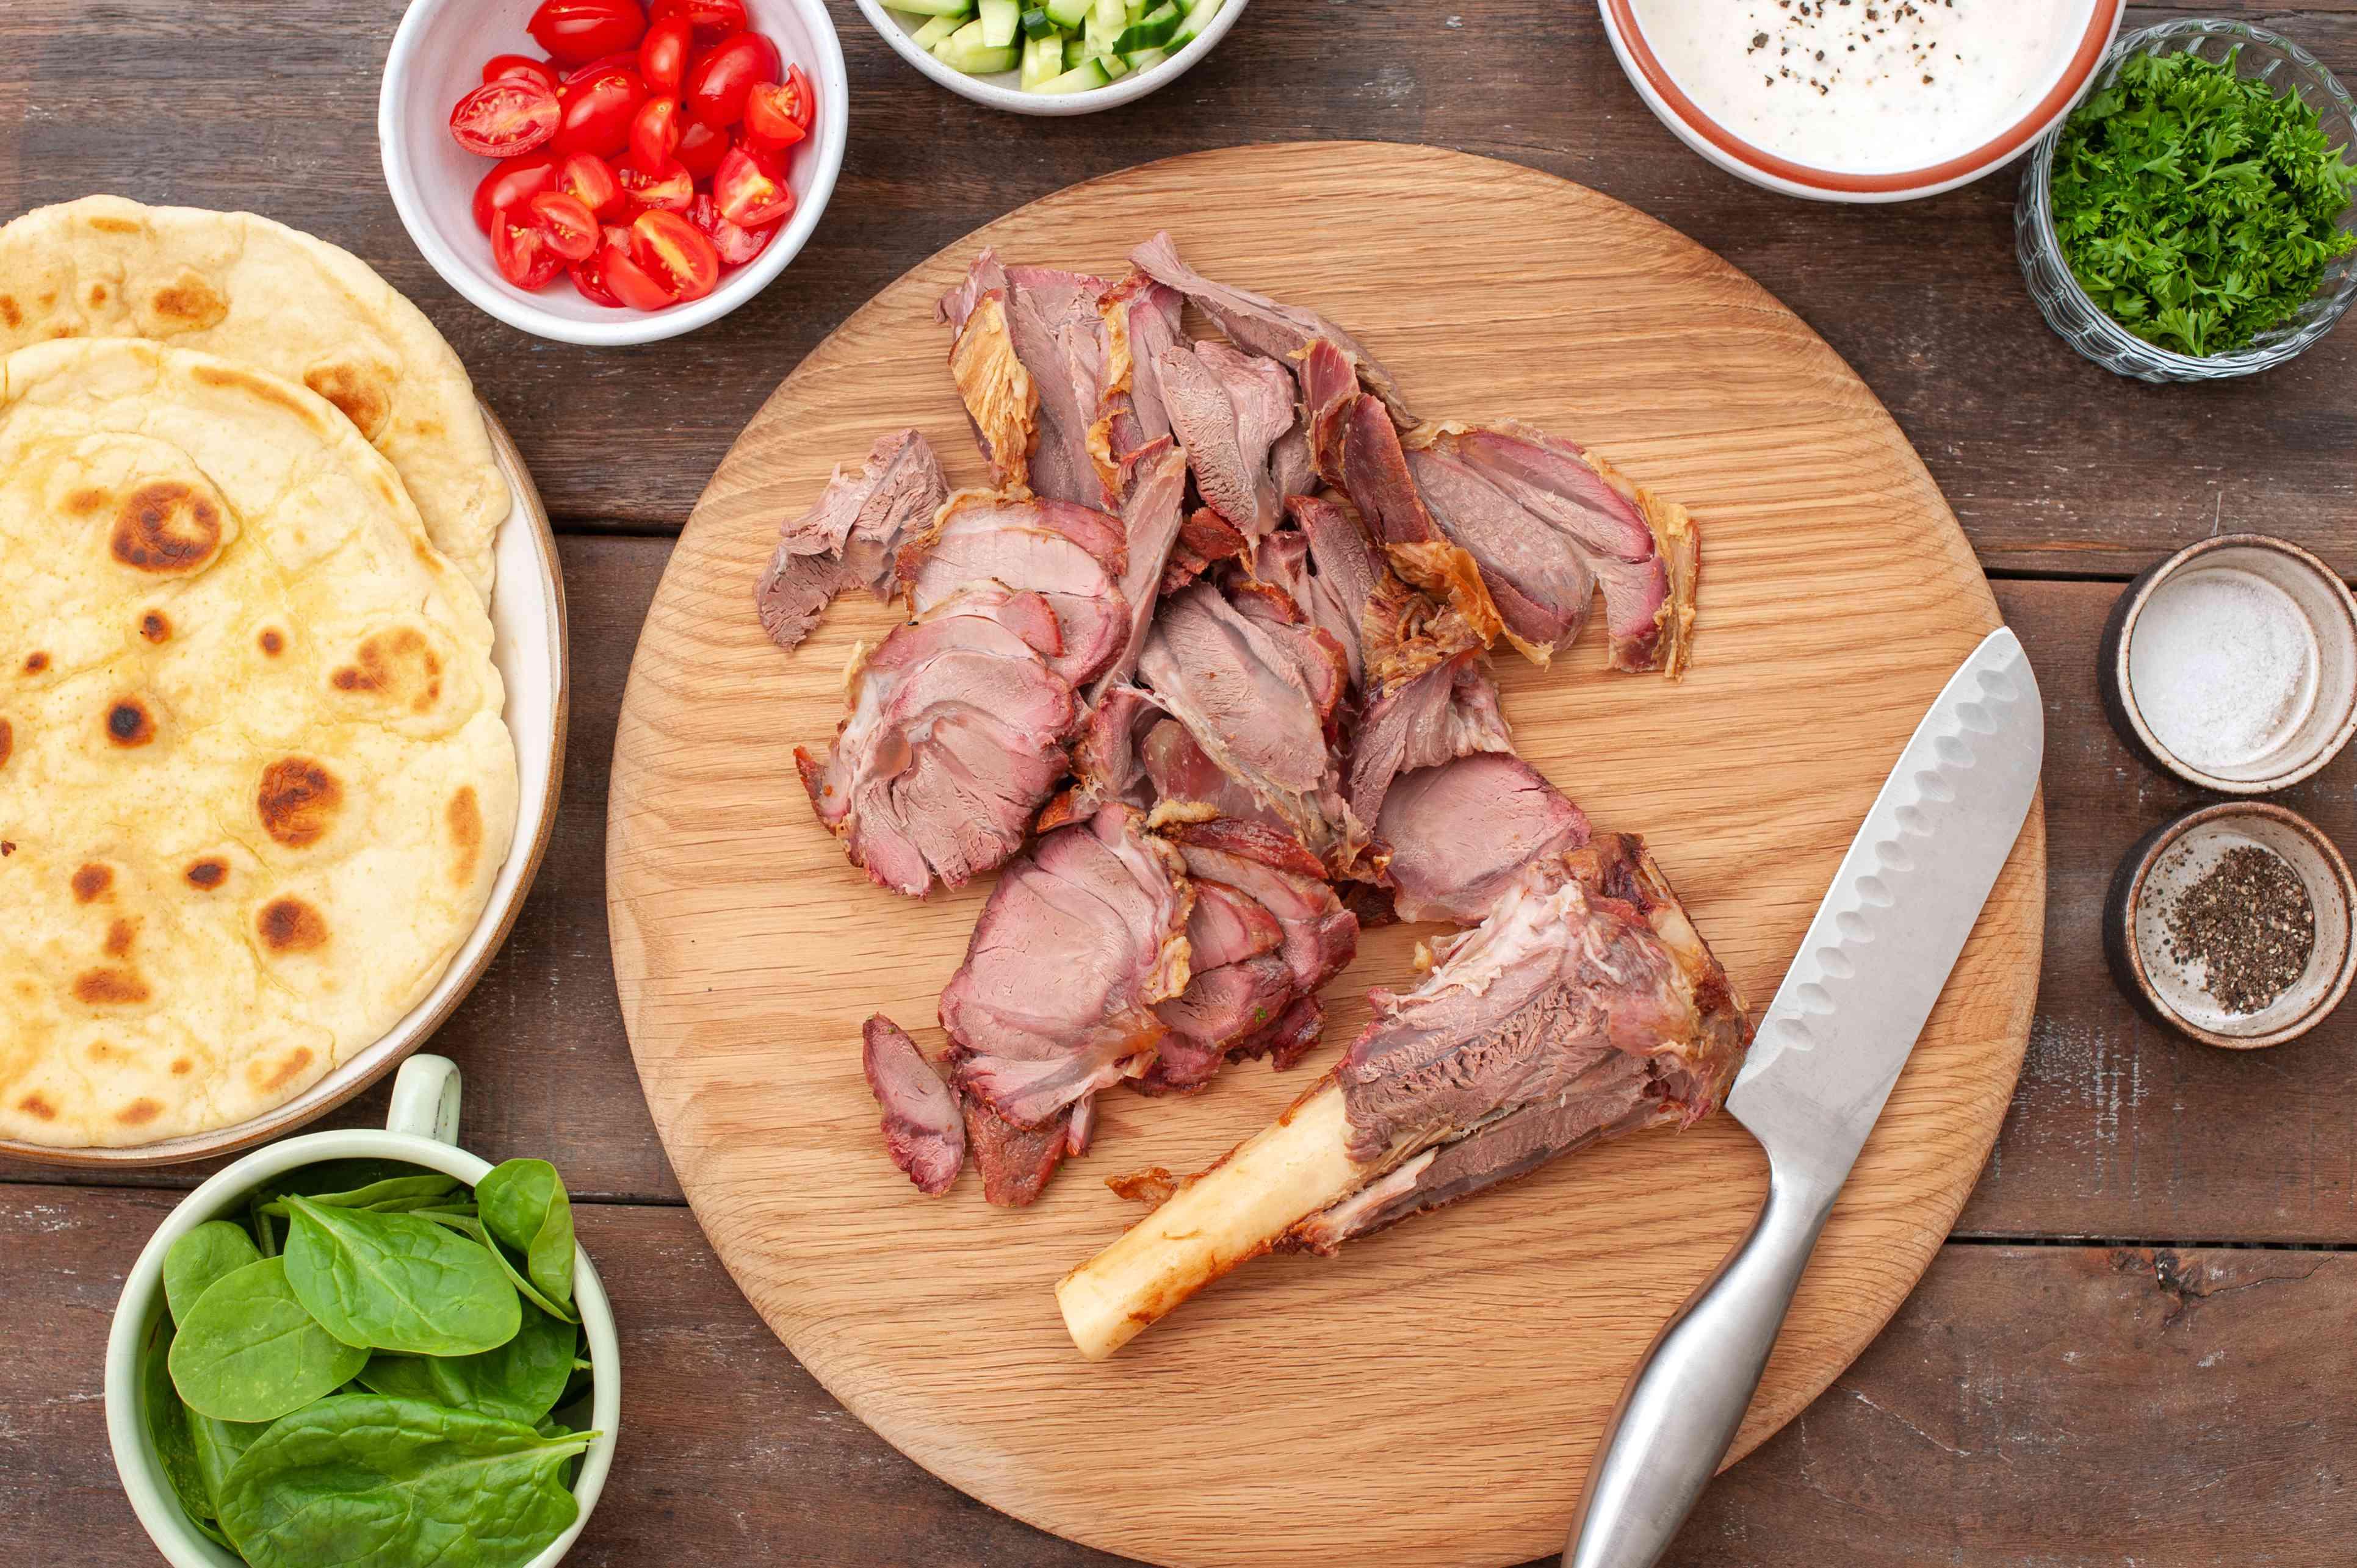 Slice lambshank